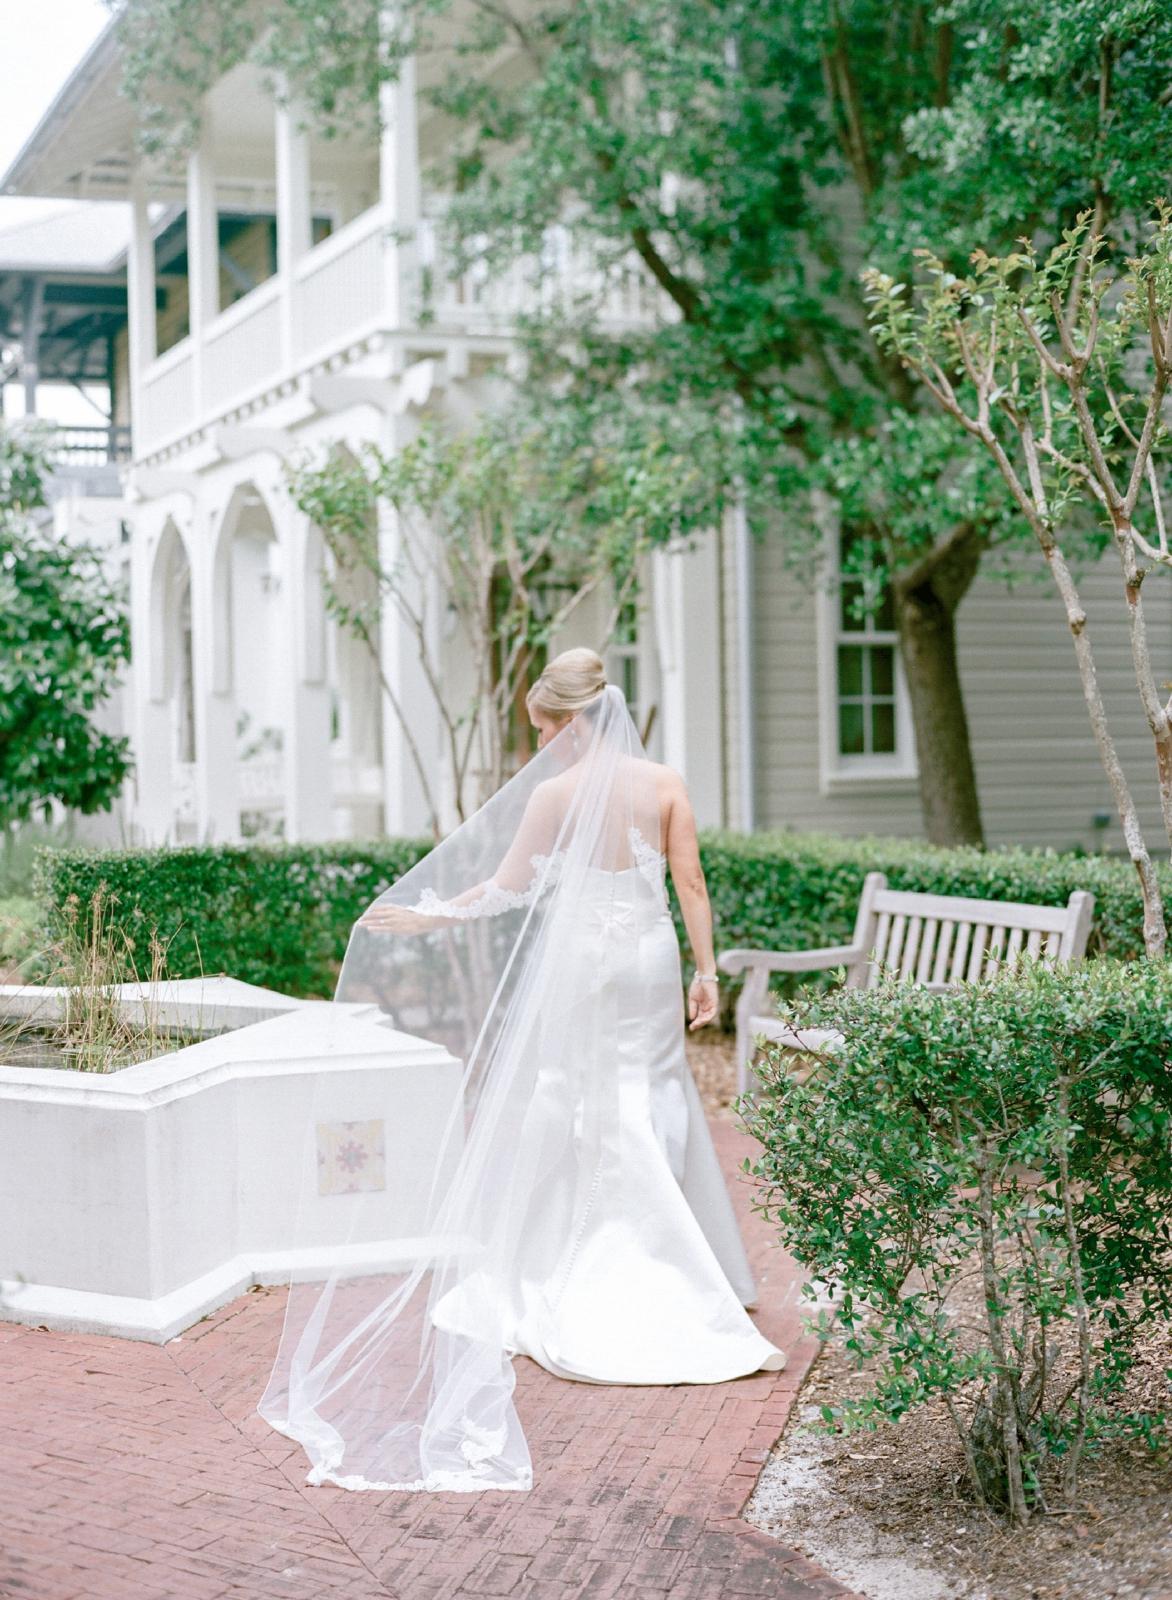 rosemary beach wedding photographer st augustine green rosemary beach shannon griffin_0021.jpg